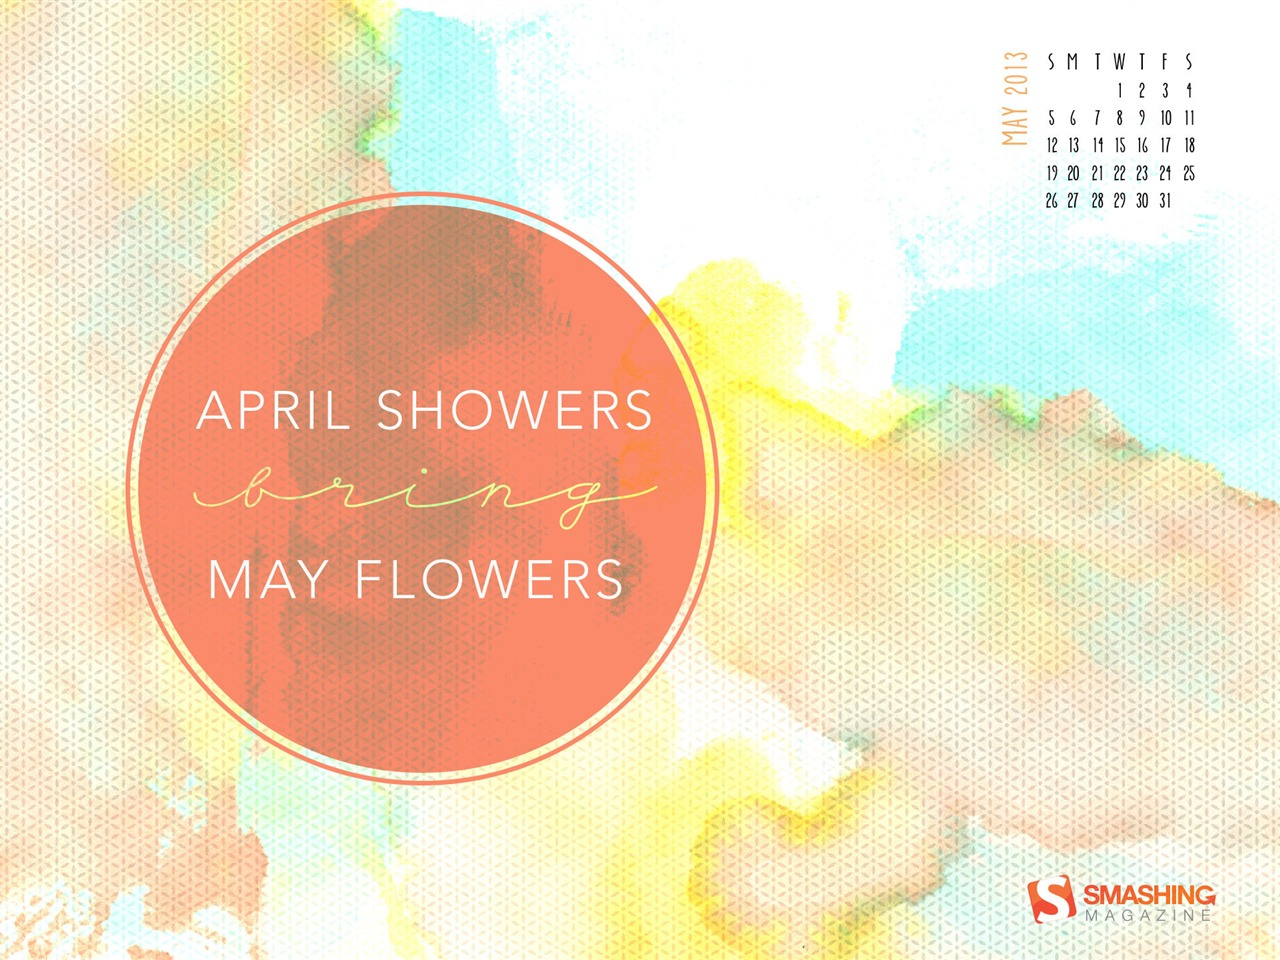 April Showers Bring May Flowers 2013 calendar desktop wallpapers View